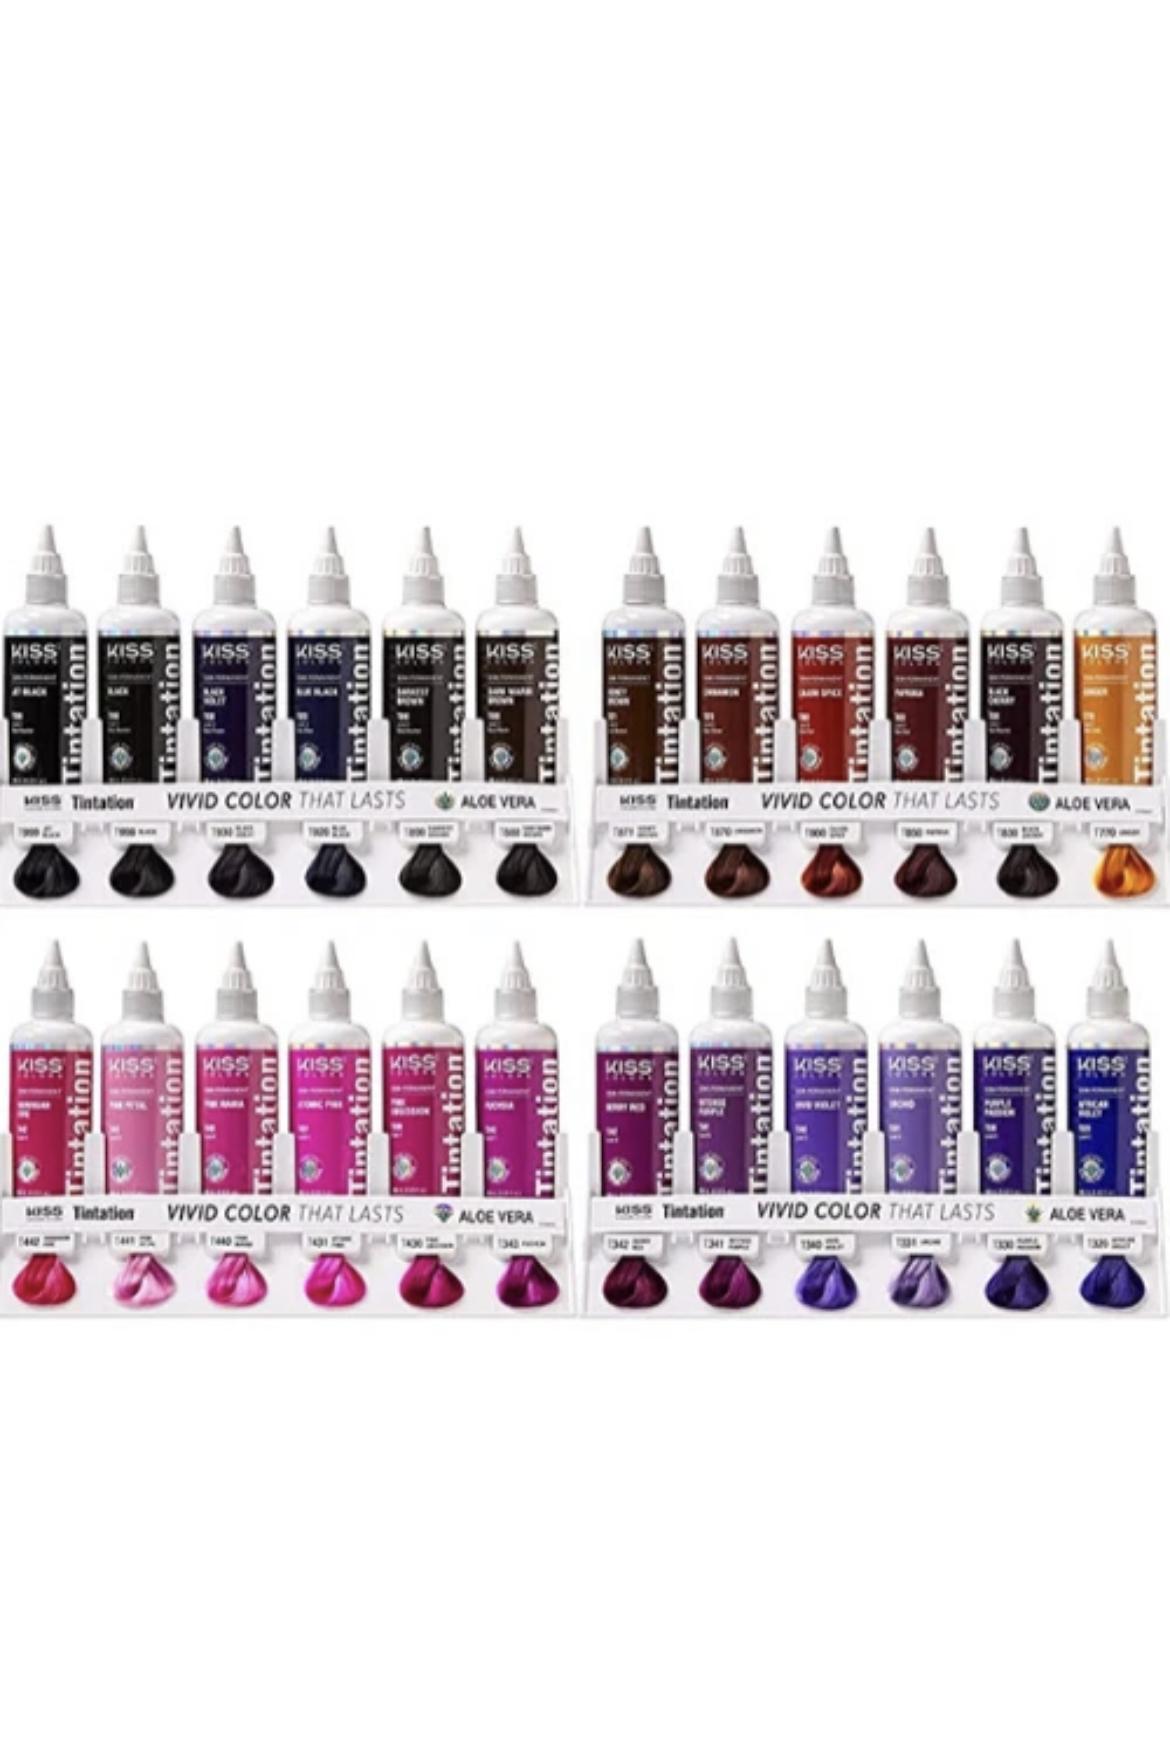 Coloration Kiss Tintation